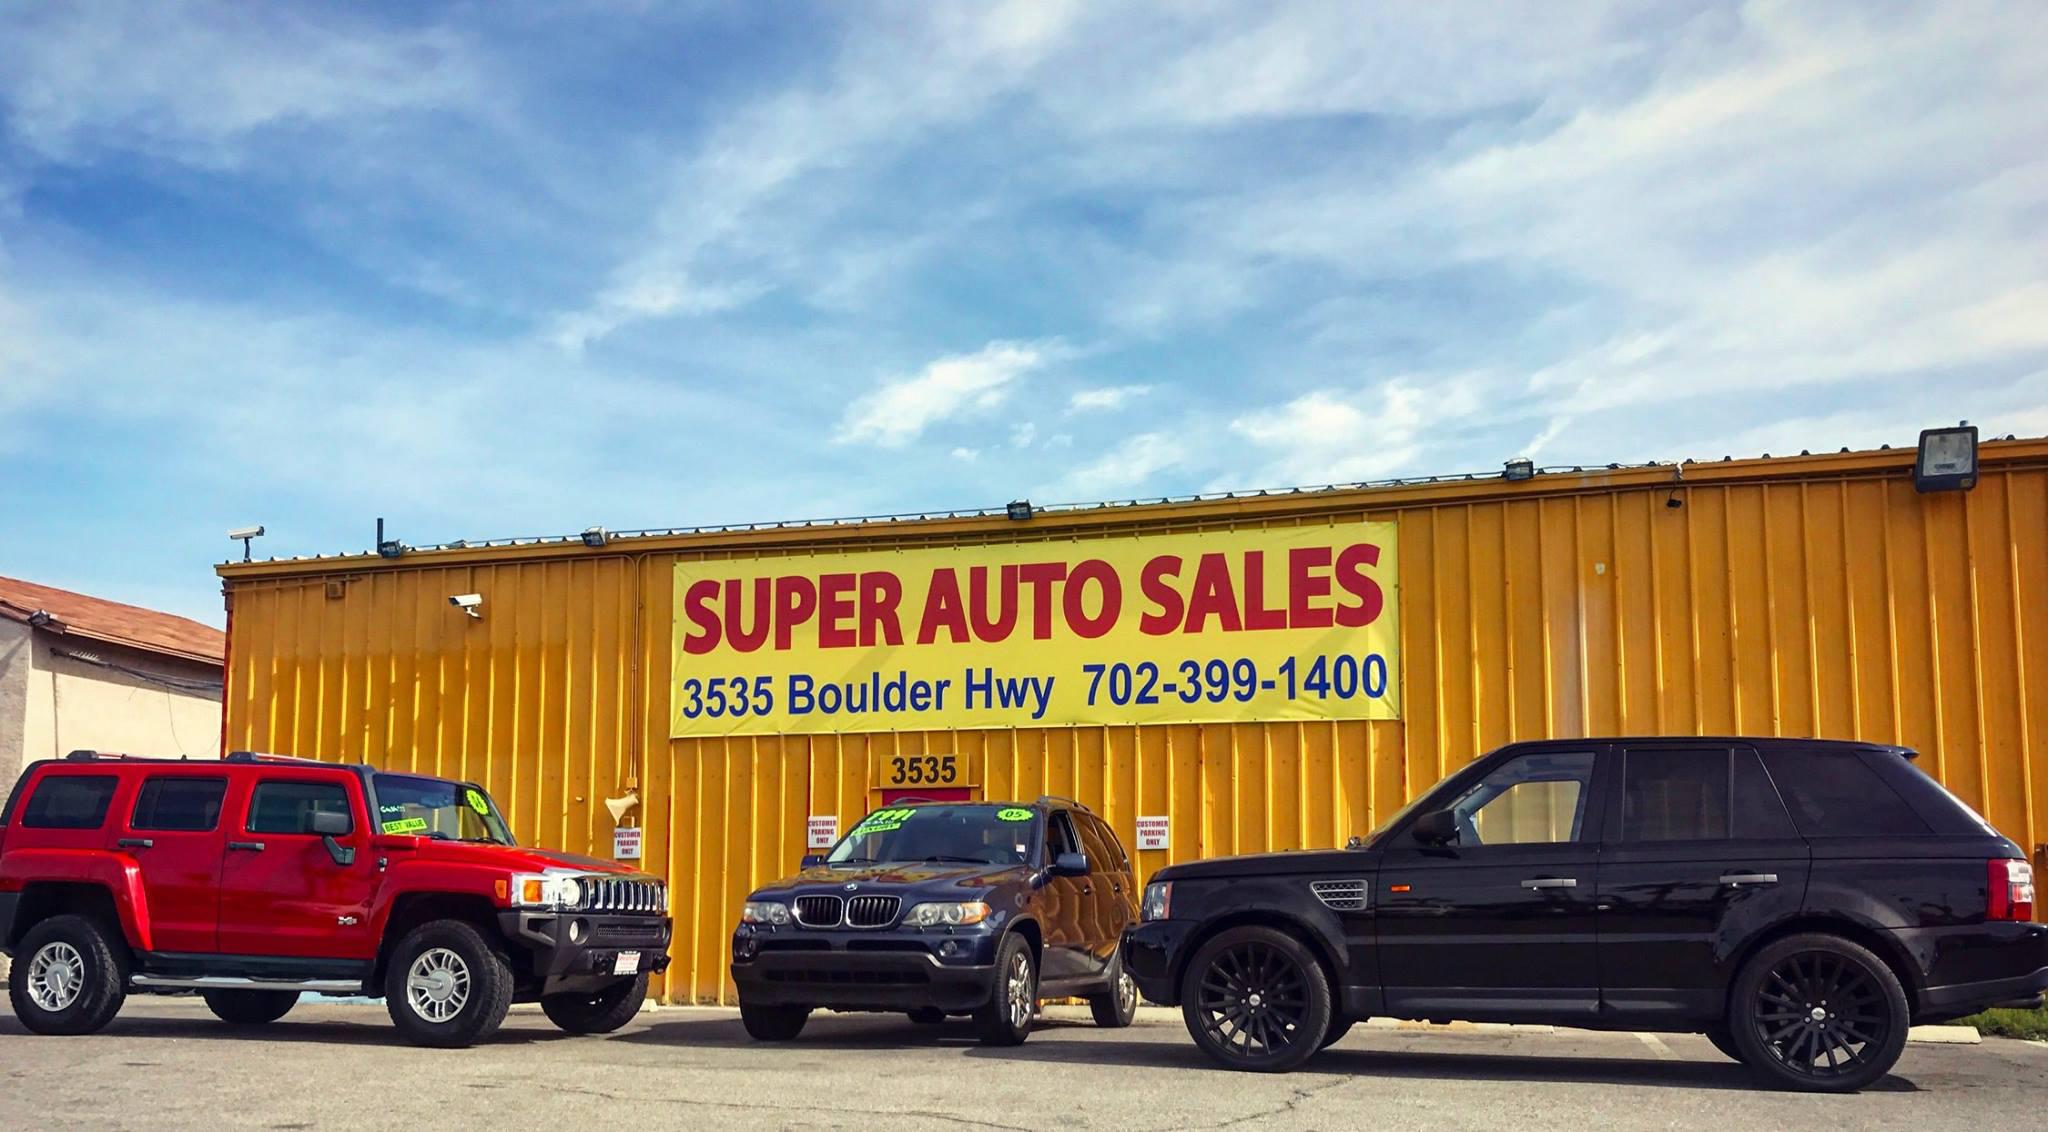 Super Auto Sales >> Super Auto Sales 3535 Boulder Hwy Las Vegas Nv 89121 Yp Com